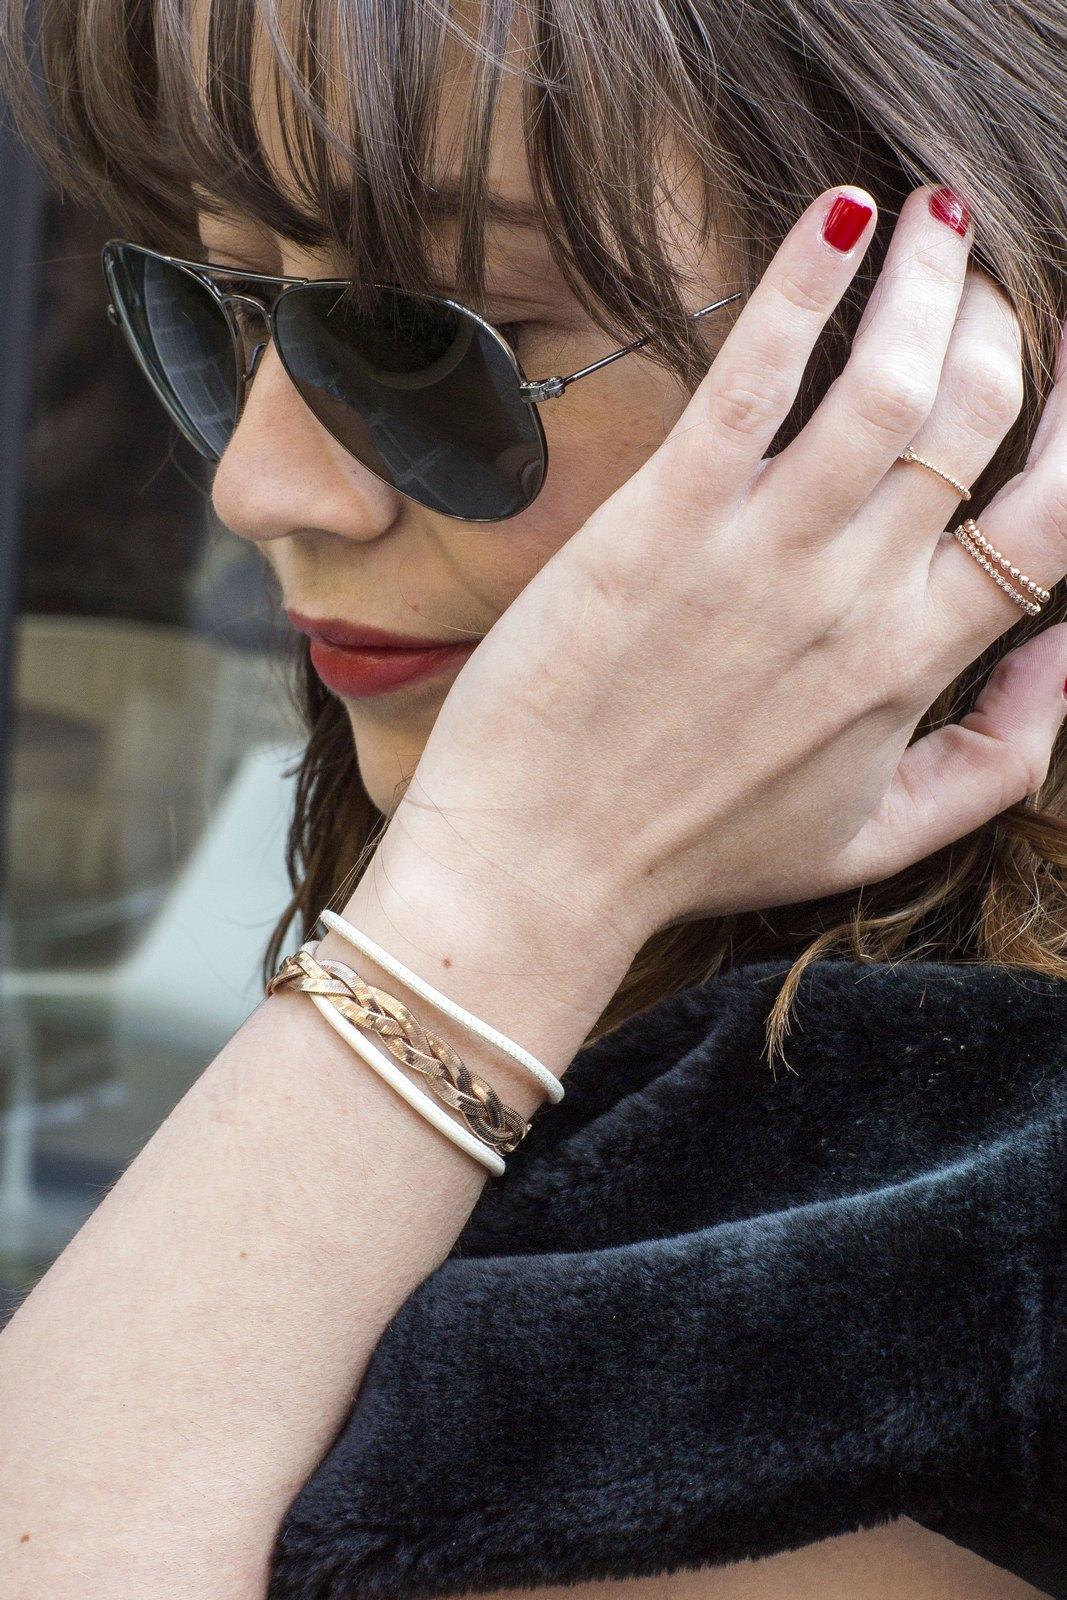 Blog mode femme Paris - Du style, Madame - Streetstyle - vintage